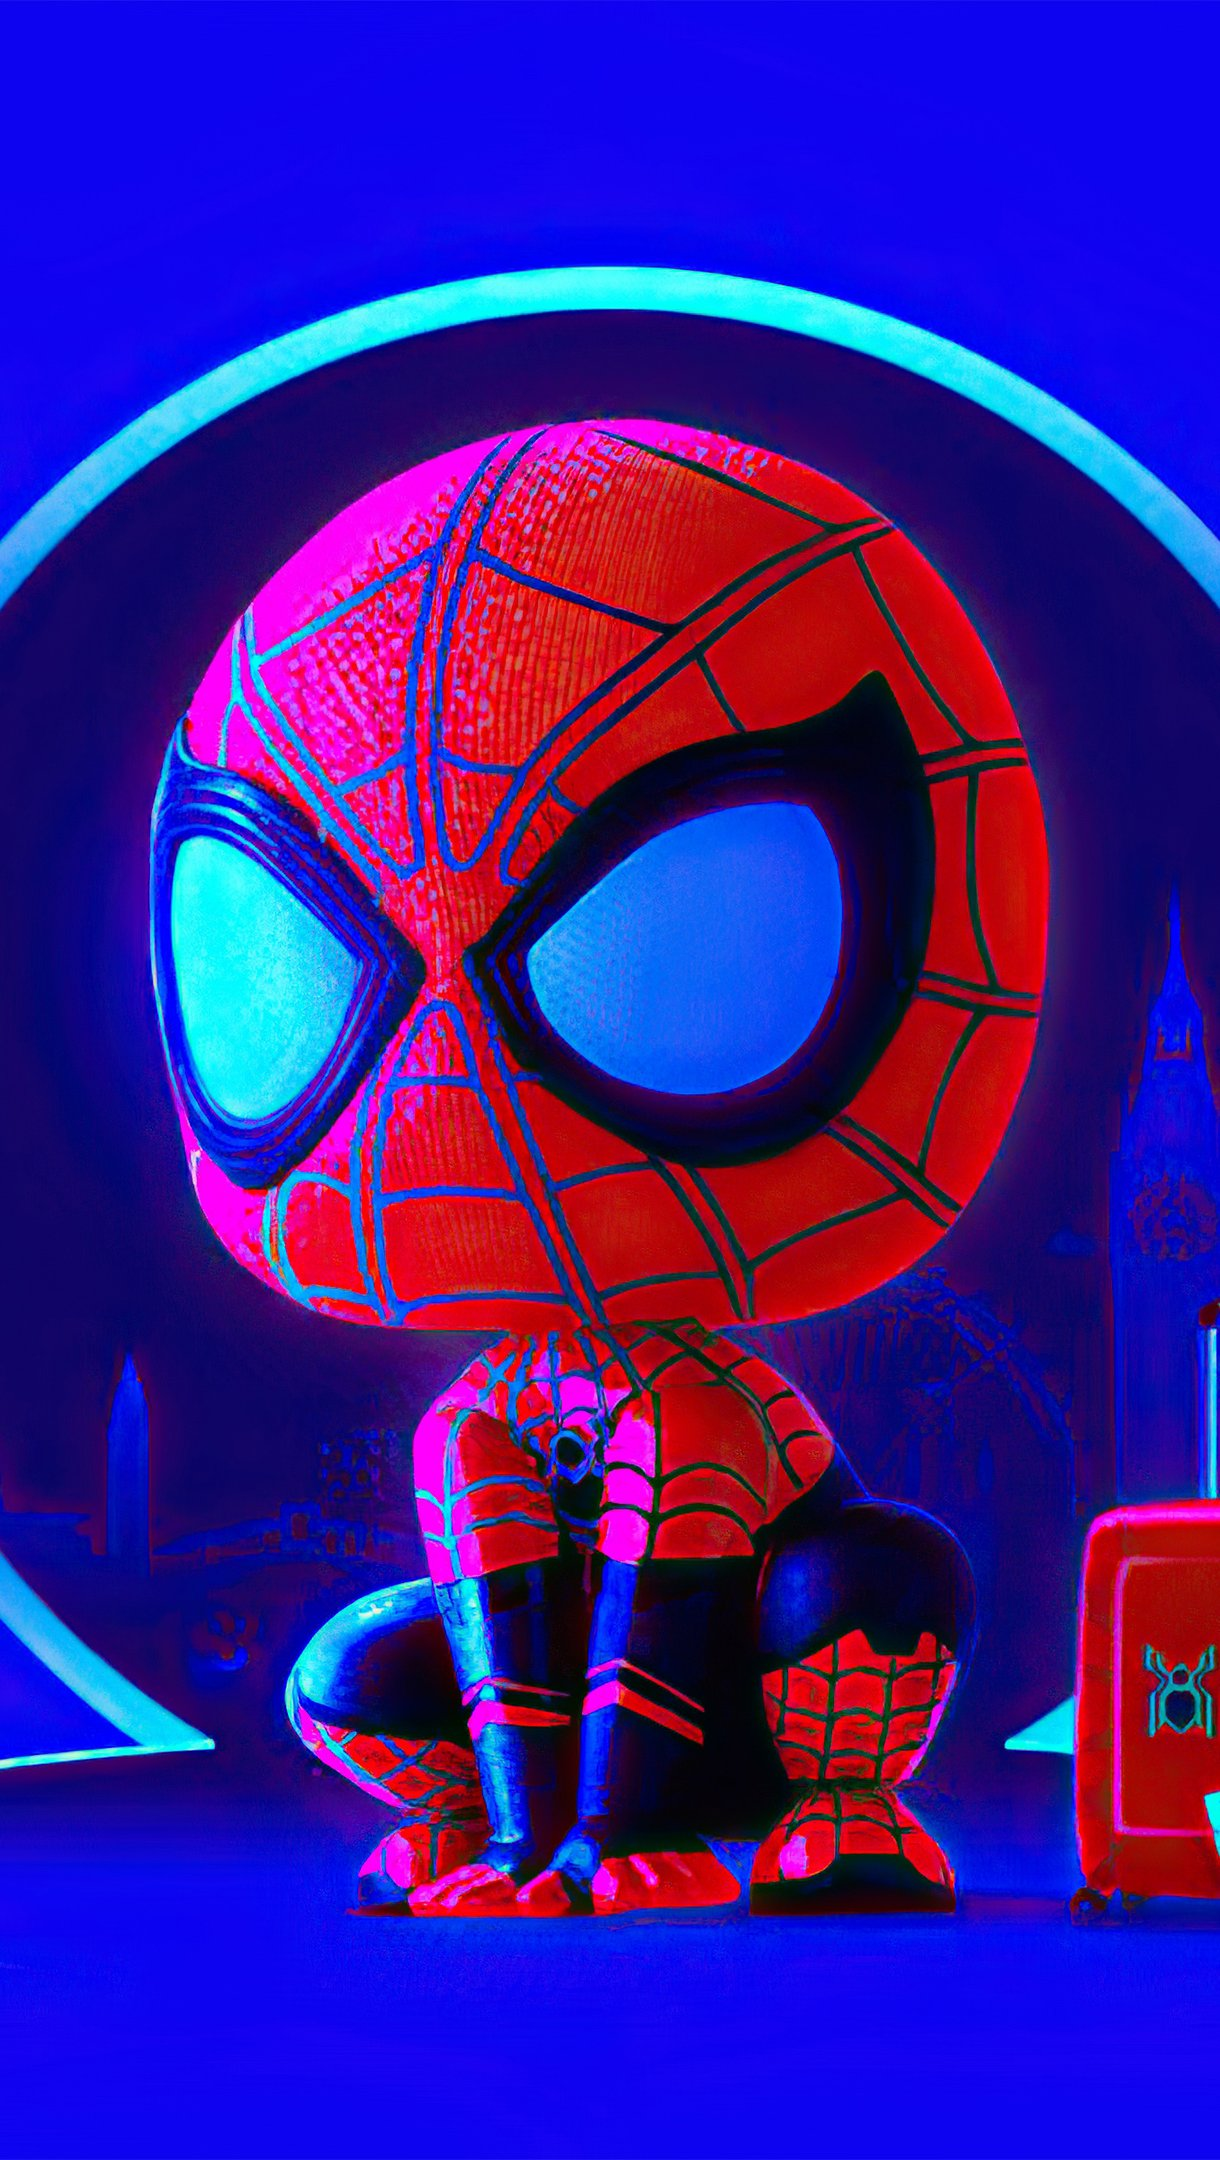 Fondos de pantalla El hombre araña Arte digital Vertical